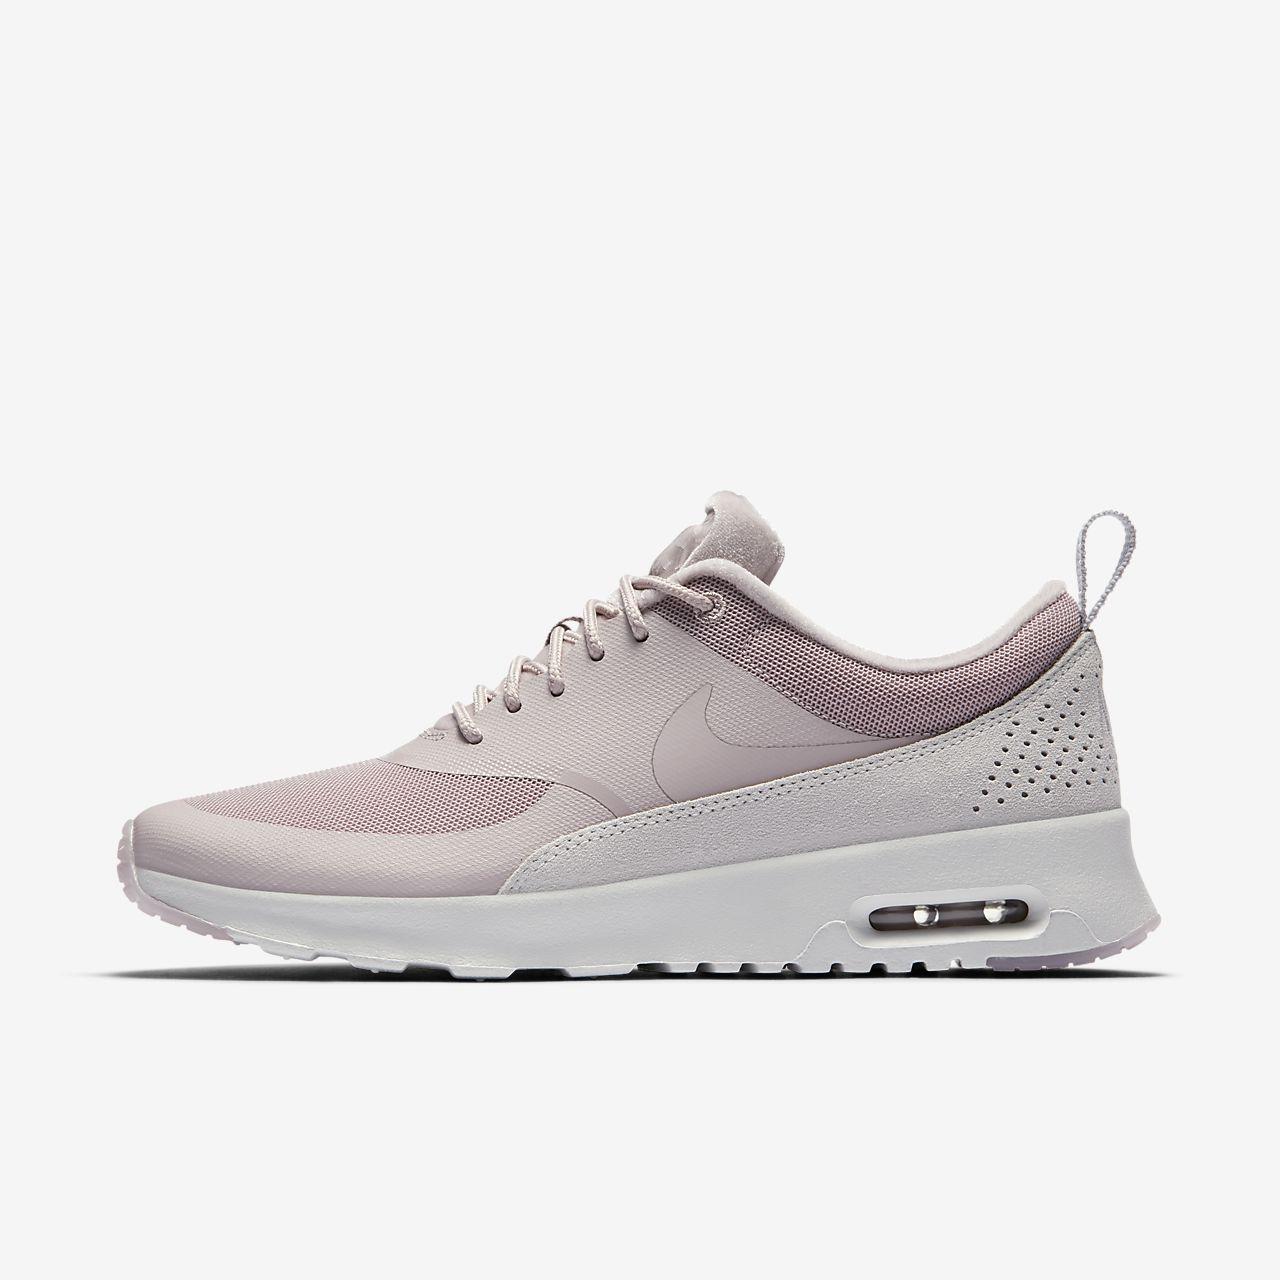 NIKE AIR MAX THEA Scarpe Sneaker da donna